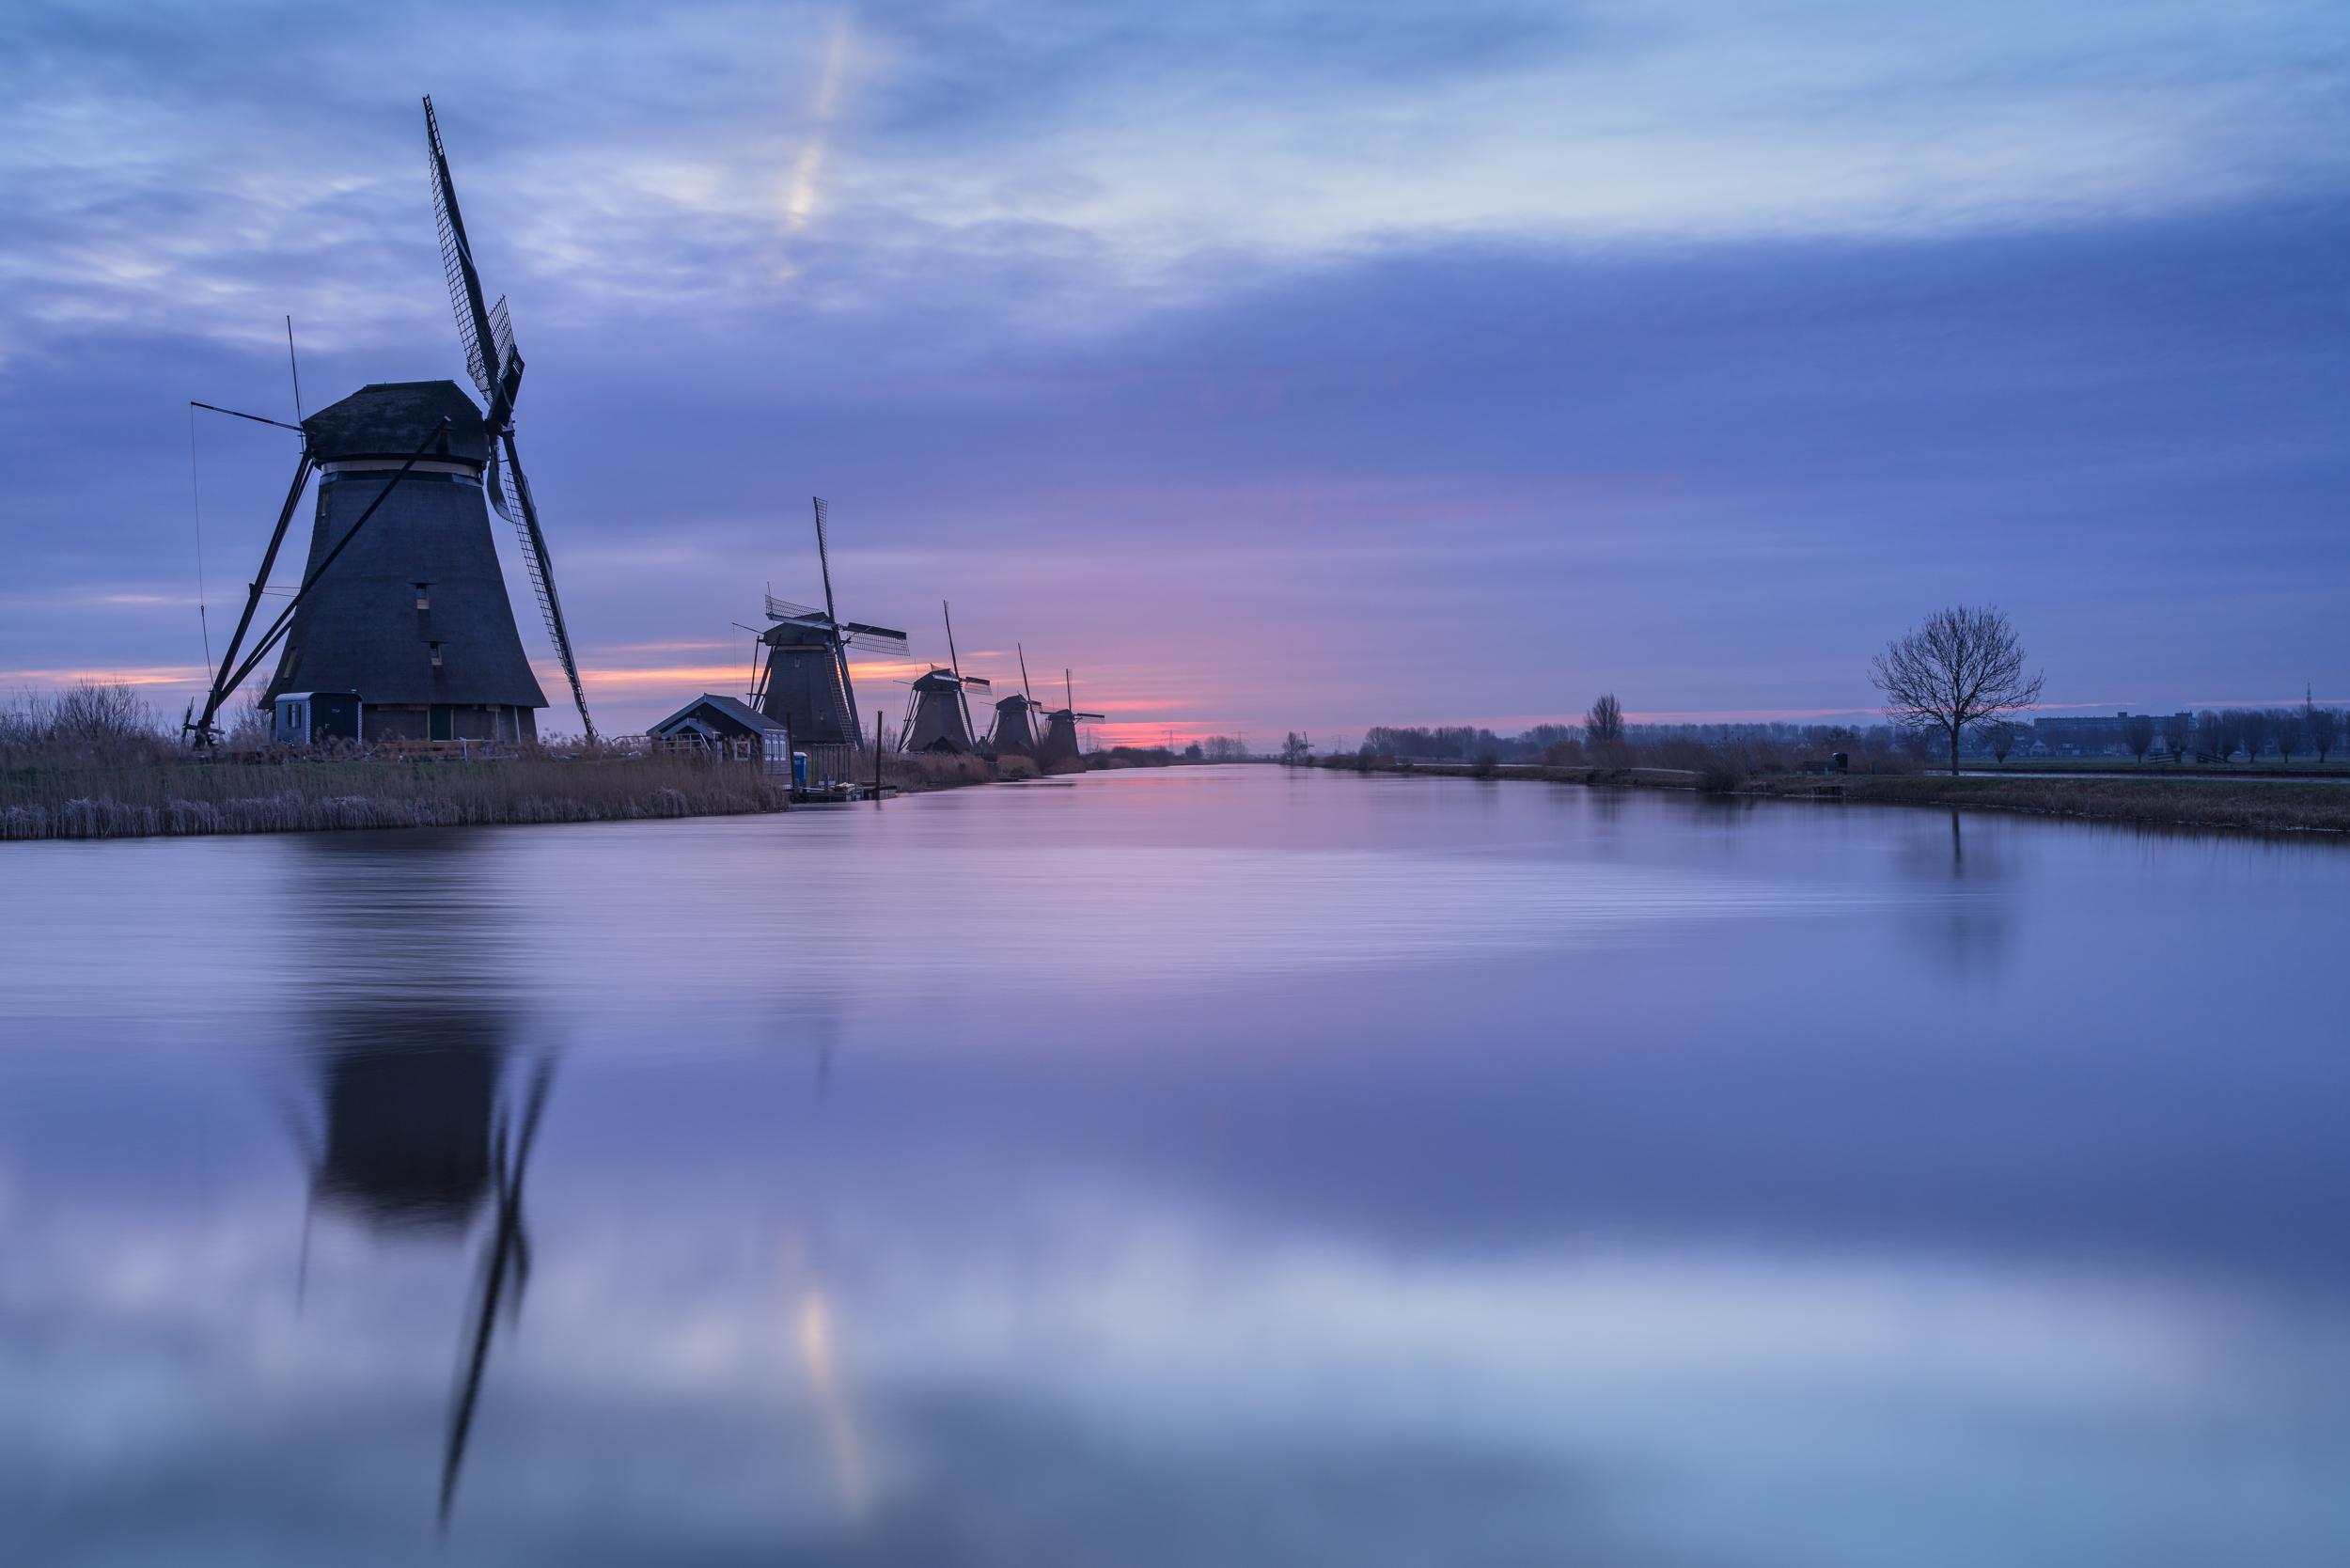 Purple morning light at Kinderdijk